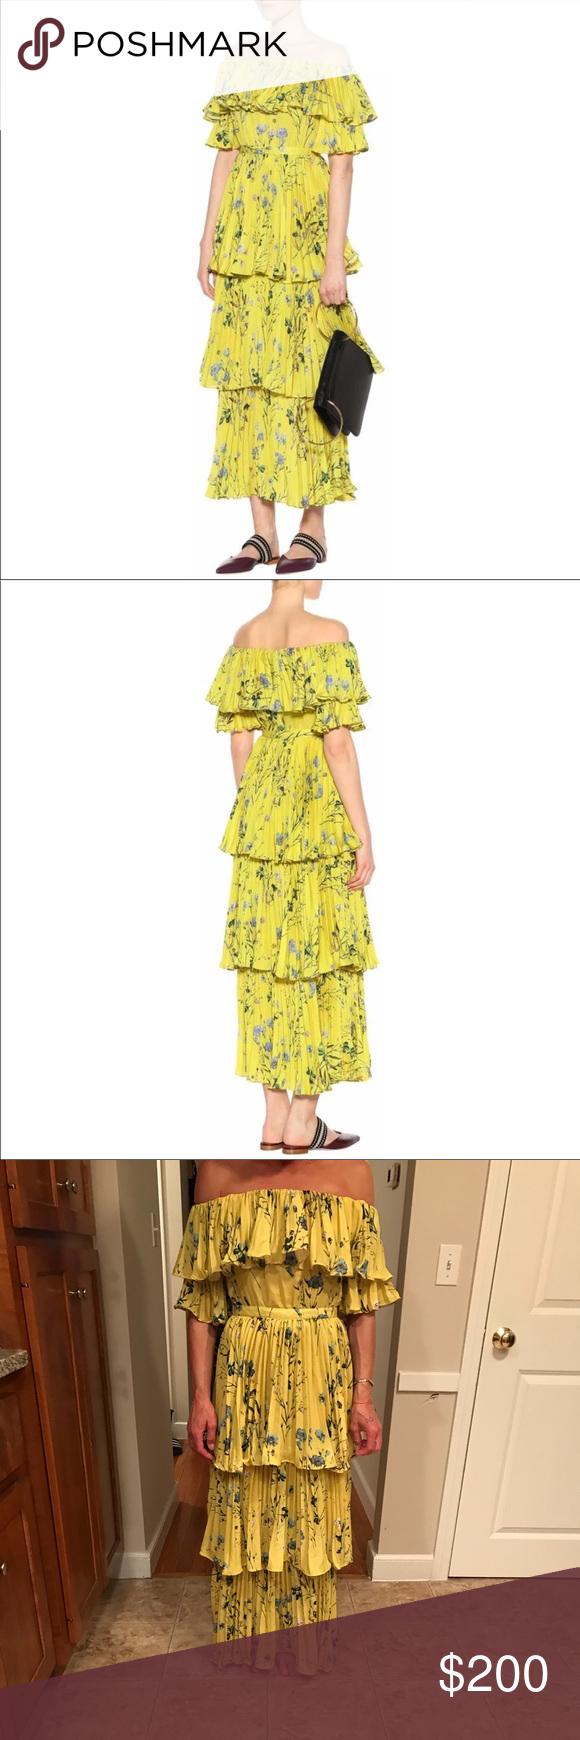 77844d8fc7 Self-Portrait Layered Floral Dress New Self-Portrait Yellow Layered Floral  Maxi Dress